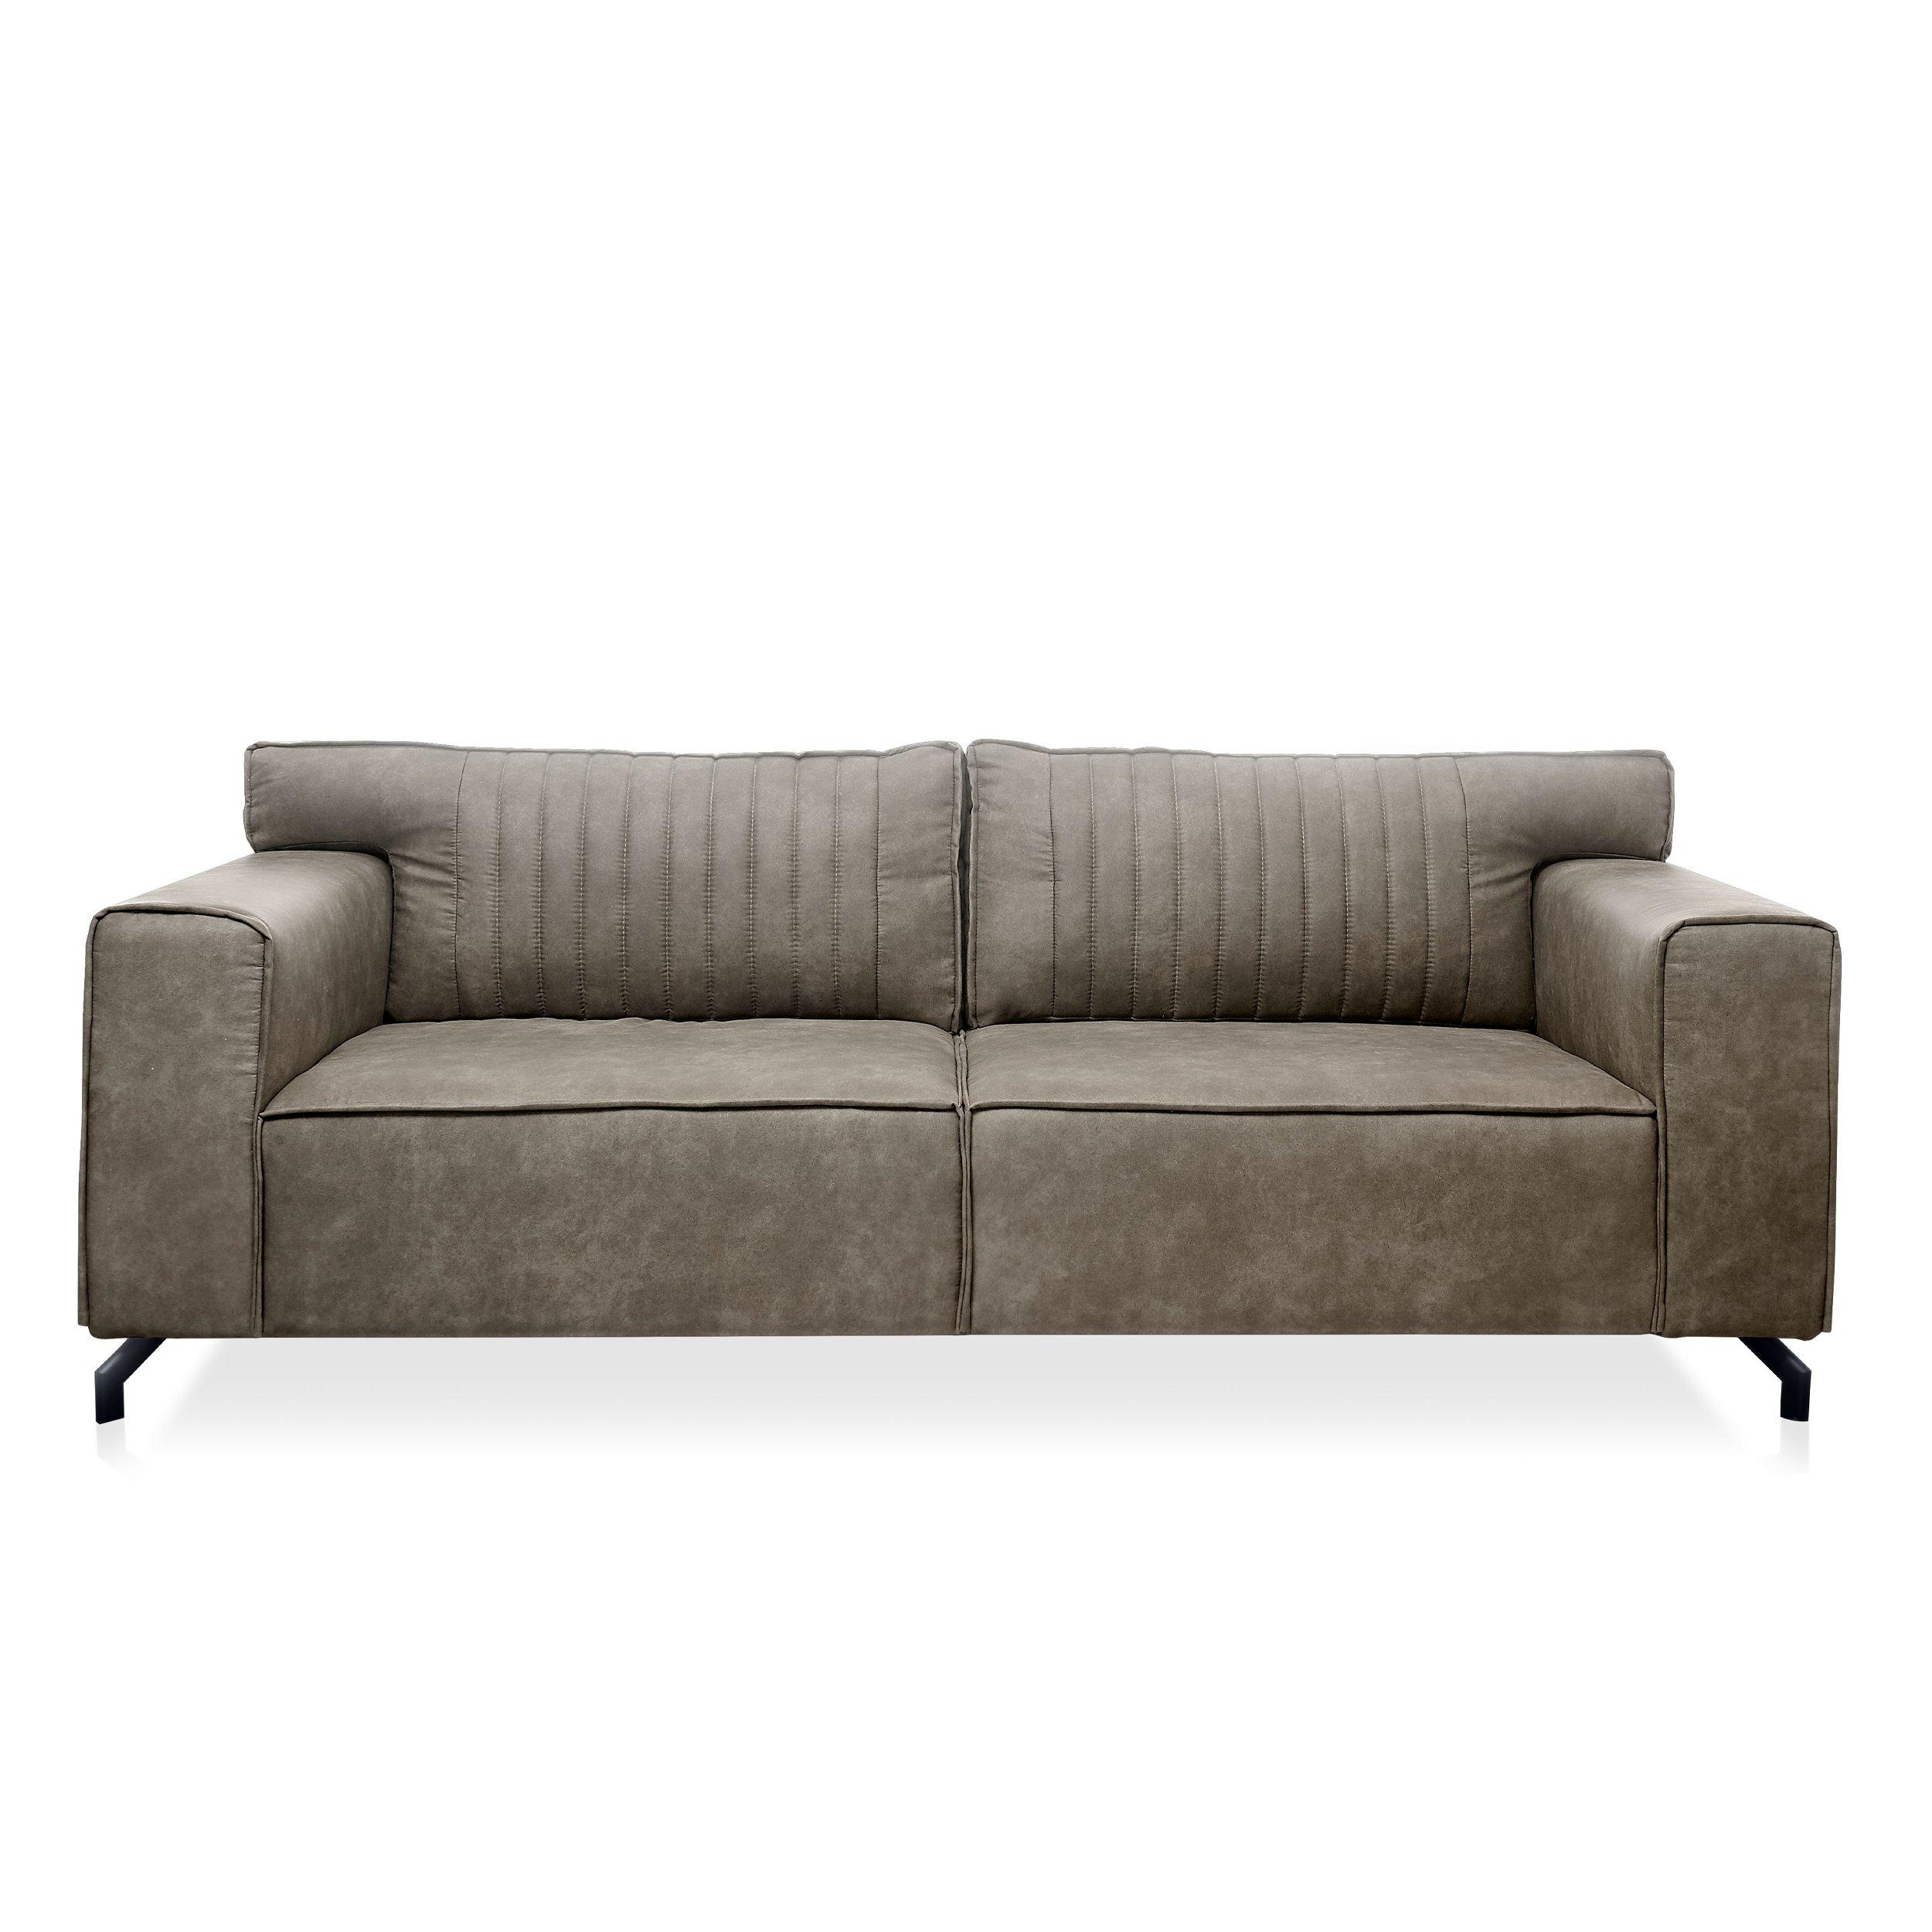 Full Size of Ikea 3 Sitzer Sofa Ektorp Mit Relaxfunktion Elektrisch Und 2 Sessel Leder Couch Schlaffunktion Poco Federkern Trendstore Nashville Blau Led Stoff Rattan Sofa 3 Sitzer Sofa